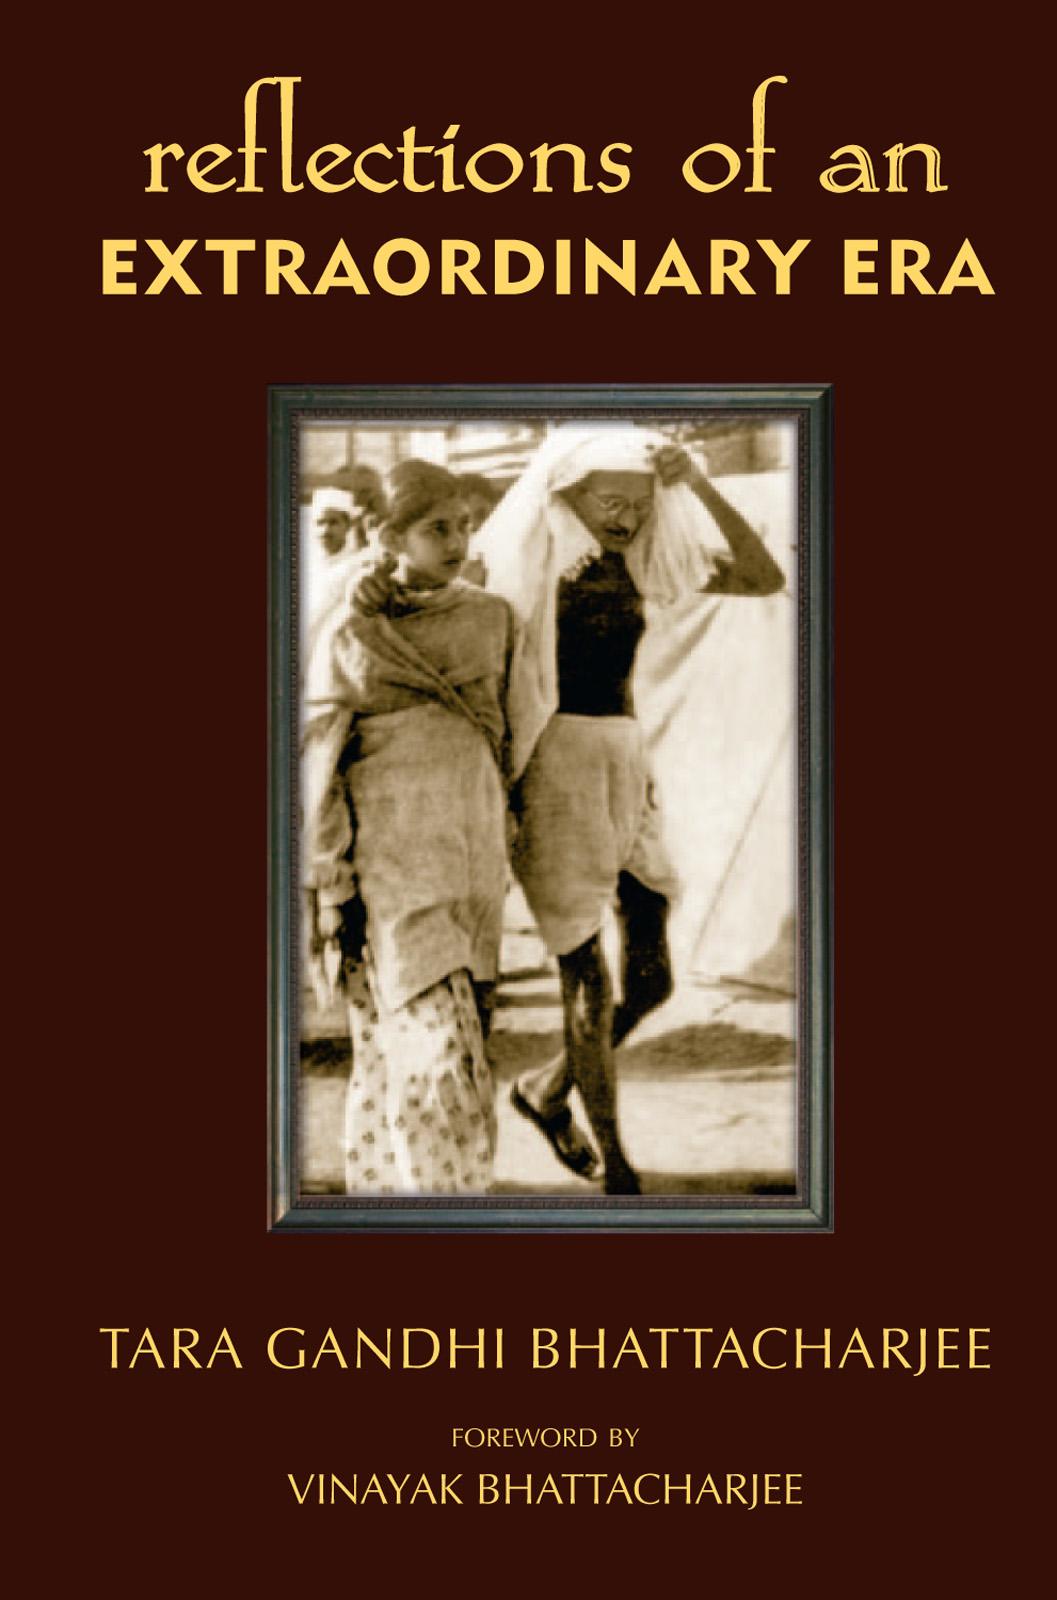 Tara Bhattacharjee Gandhi Reflections of an Extraordinary Era